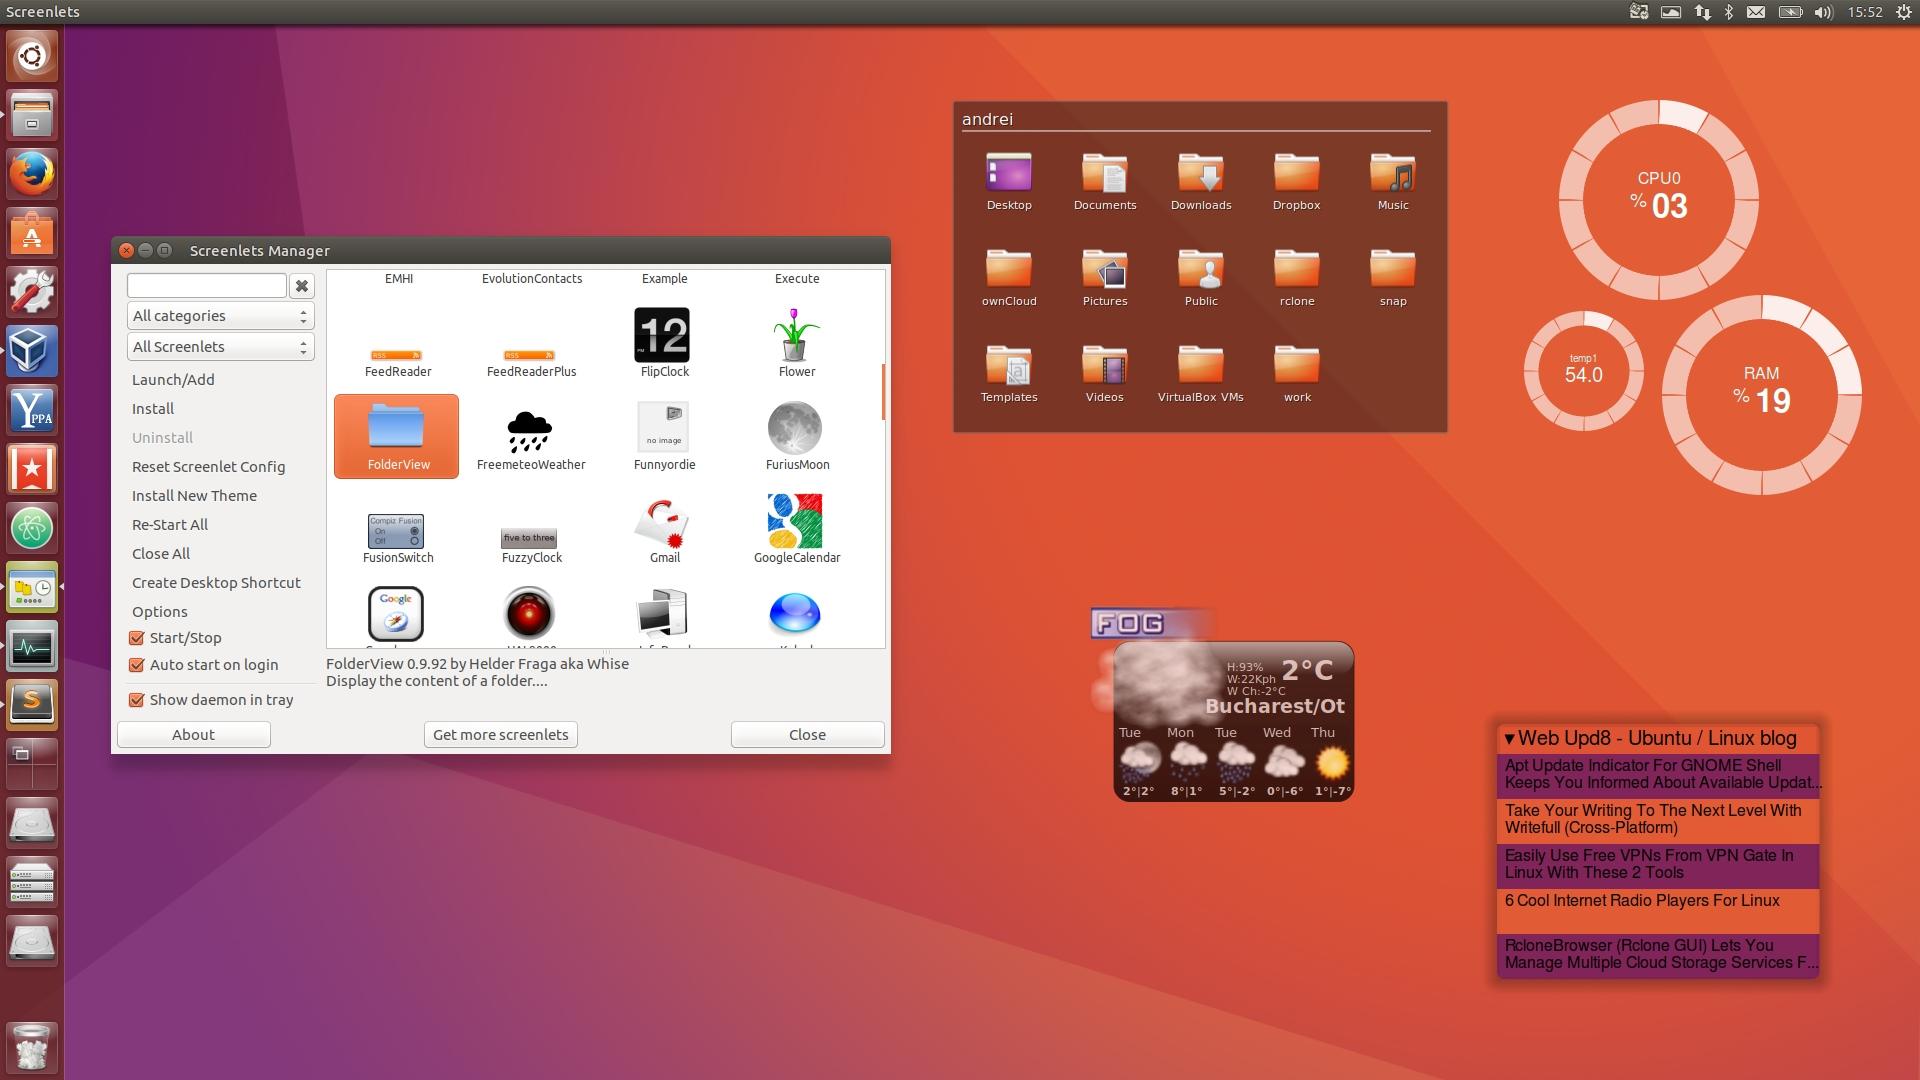 Screenlets (Desktop Widgets) Fixed For Ubuntu 16.04, Available In_Calendar Countdown On Desktop